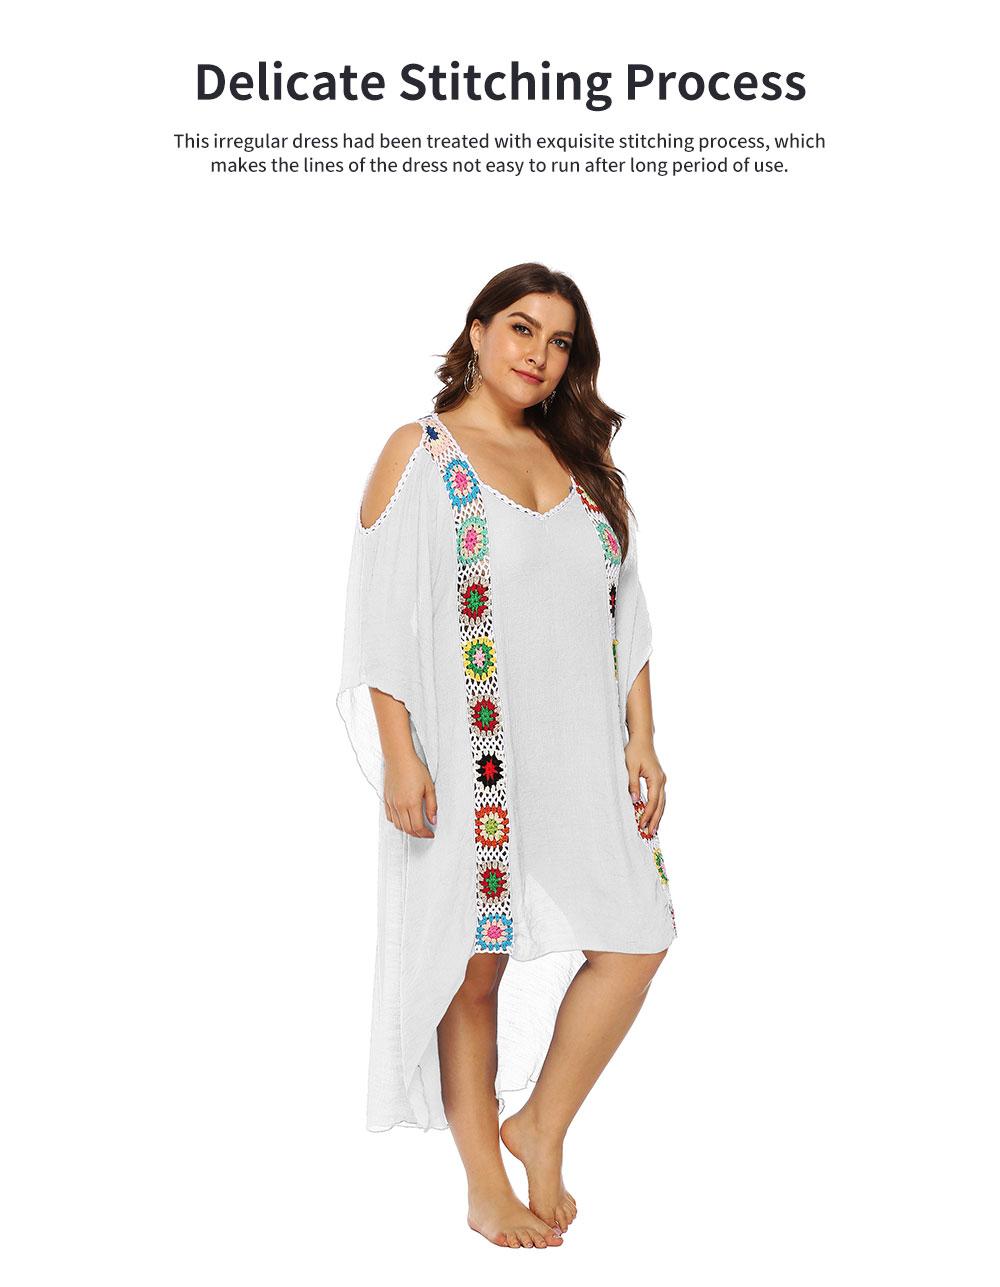 Minimalist Elegant Large Size Off-the-Shoulder Irregular Joint Dress Soft Slub Cotton Bikini Smock Beach Long Dress 5